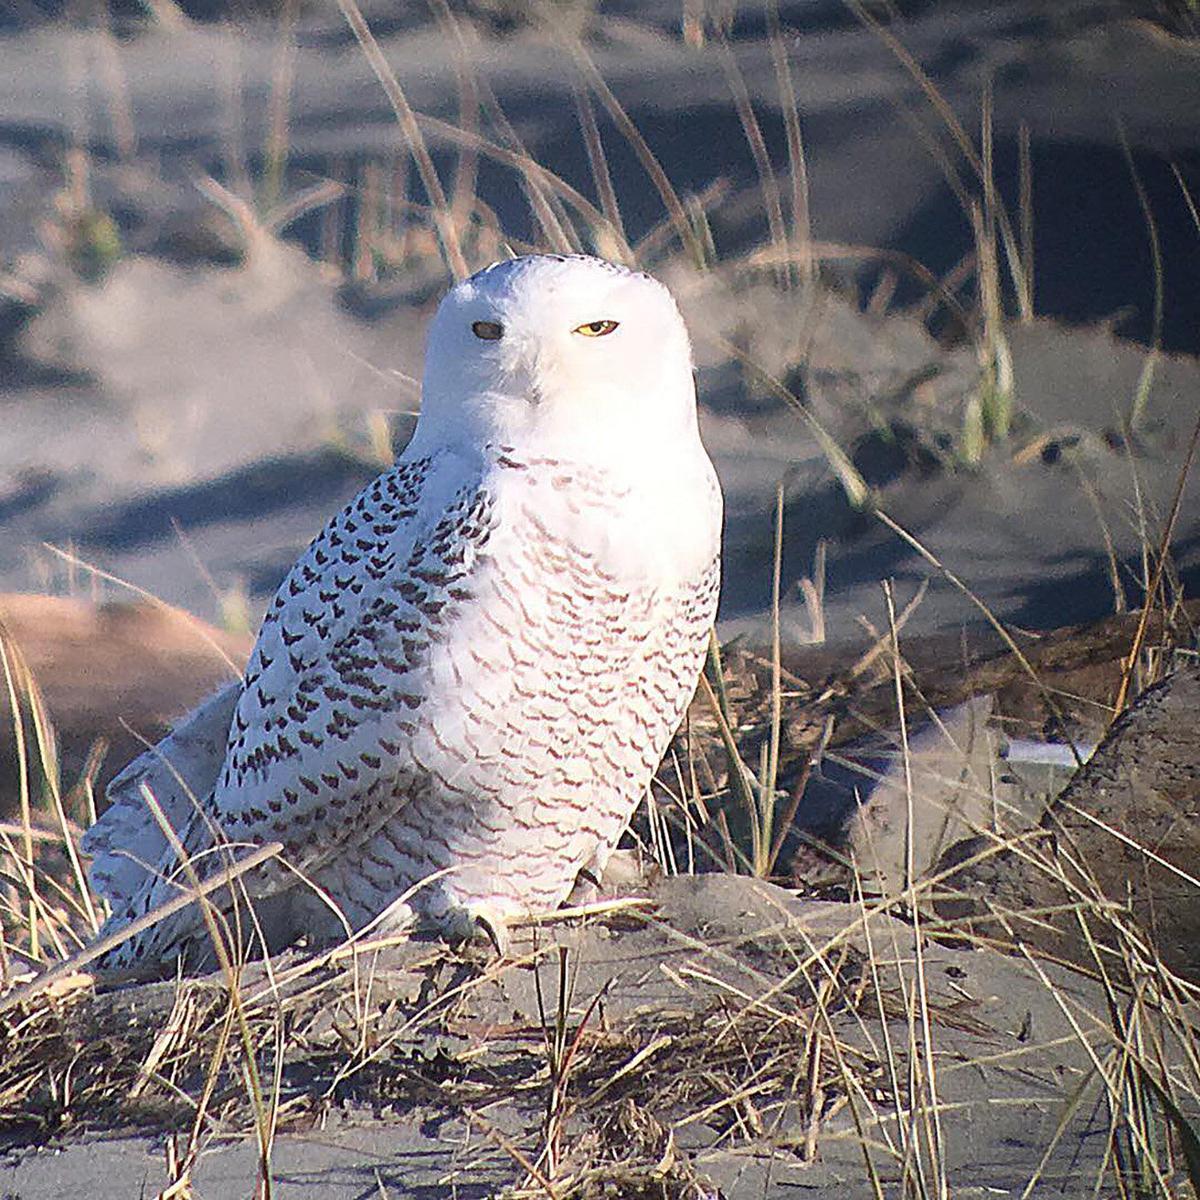 Birdwatching:  Snowy owls are back on Peninsula